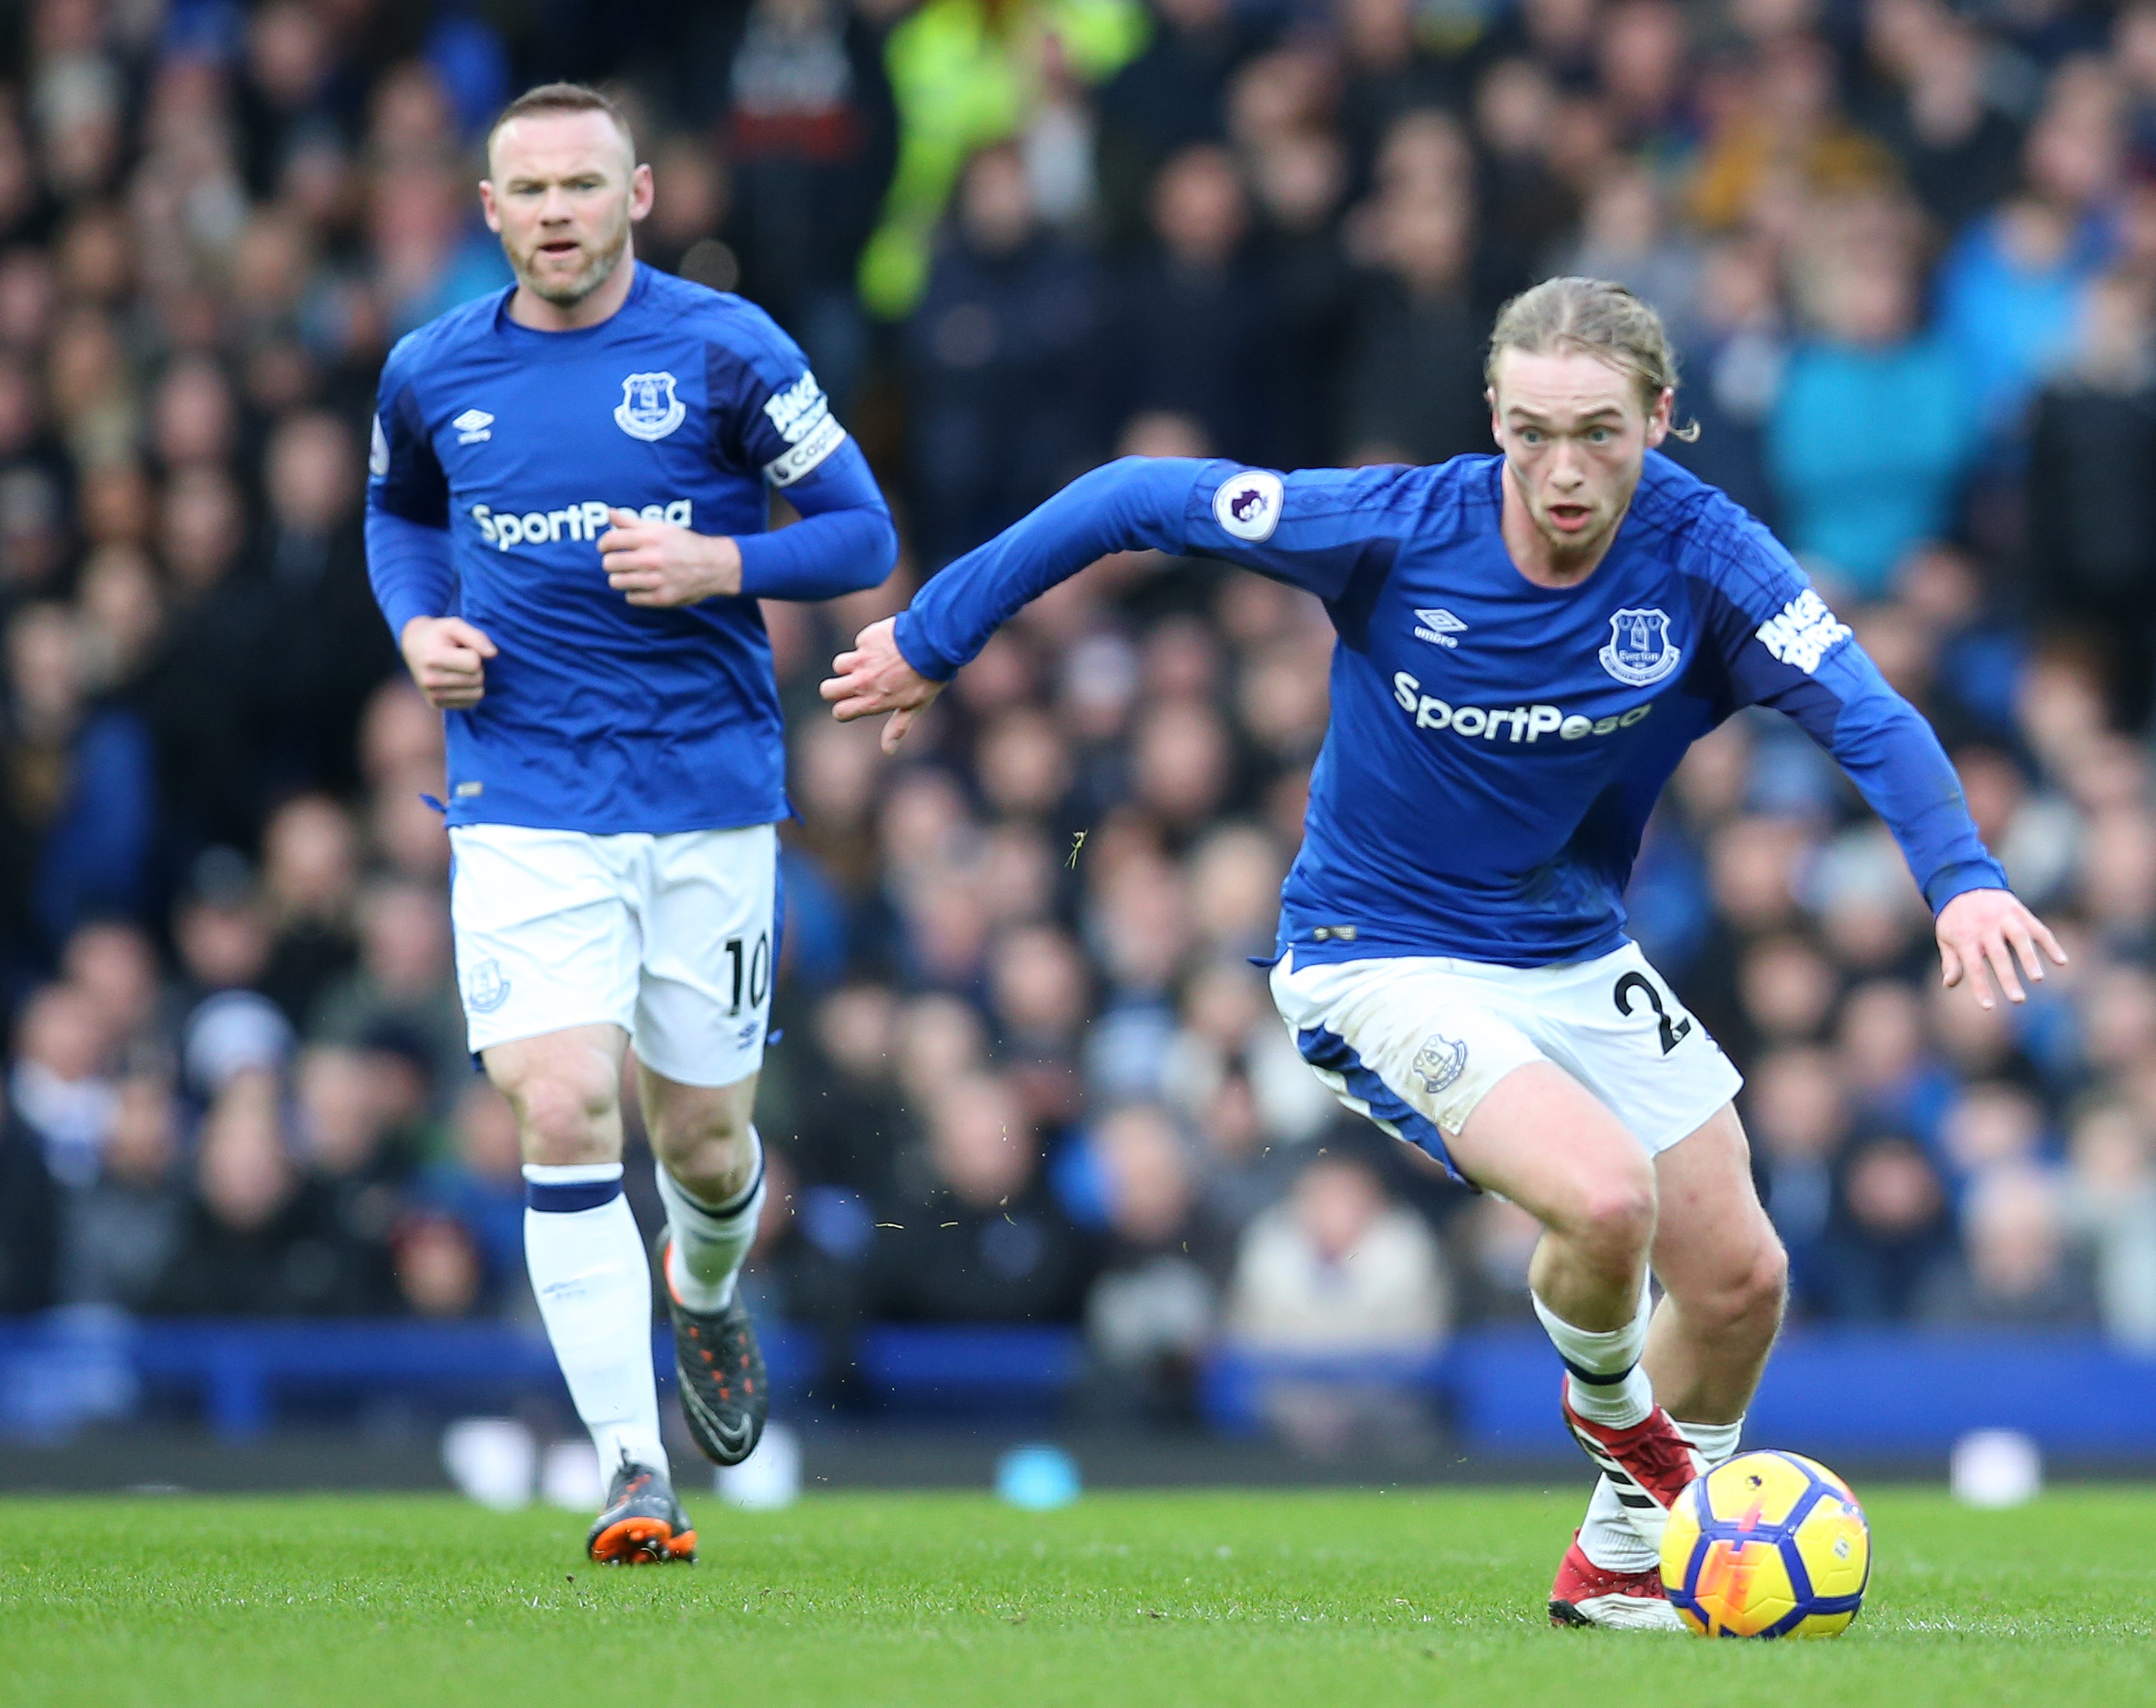 2018 EPL Premier League Football Everton v Crystal Palace Feb 10th